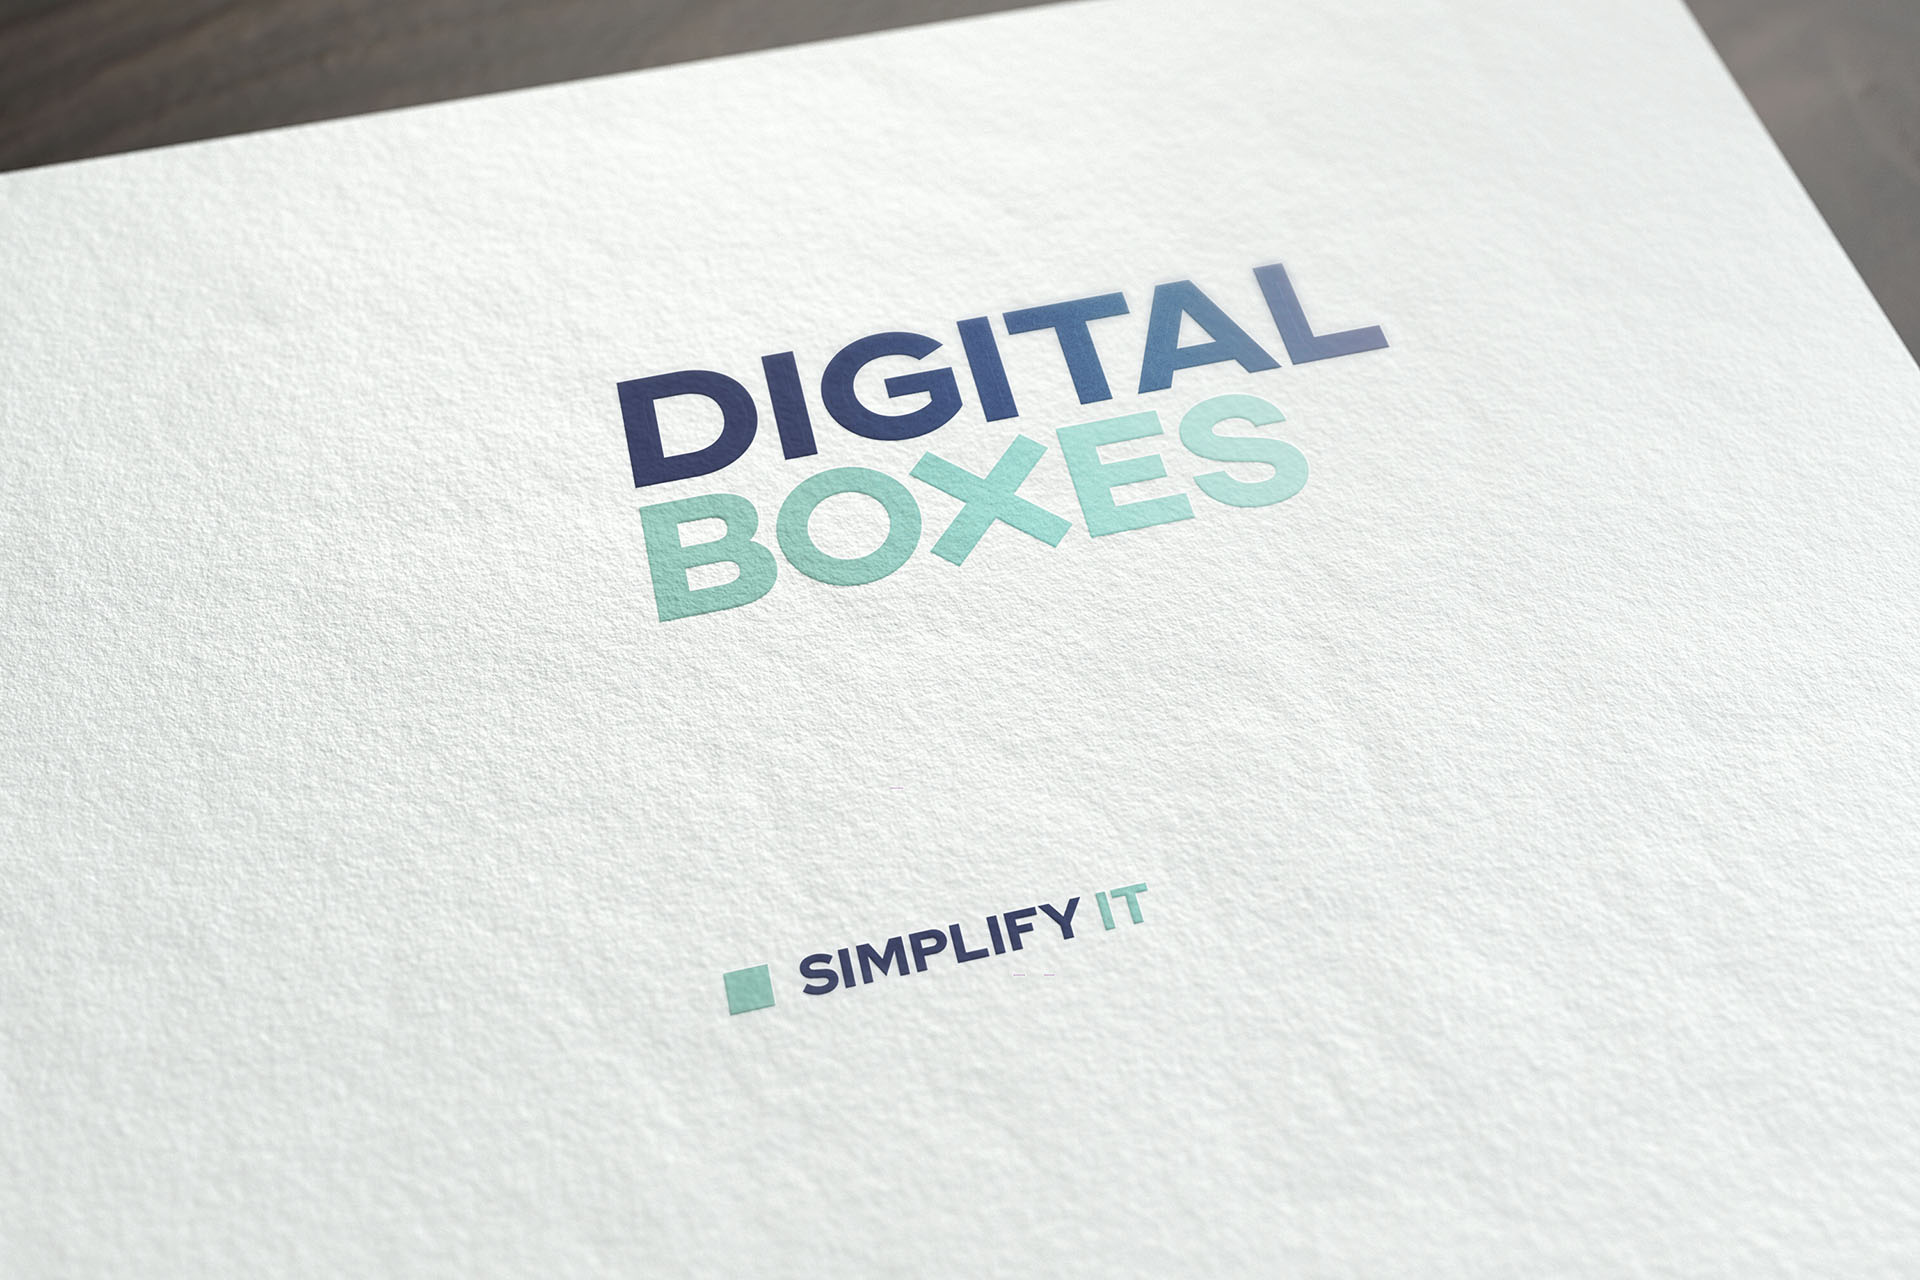 Digital Boxes